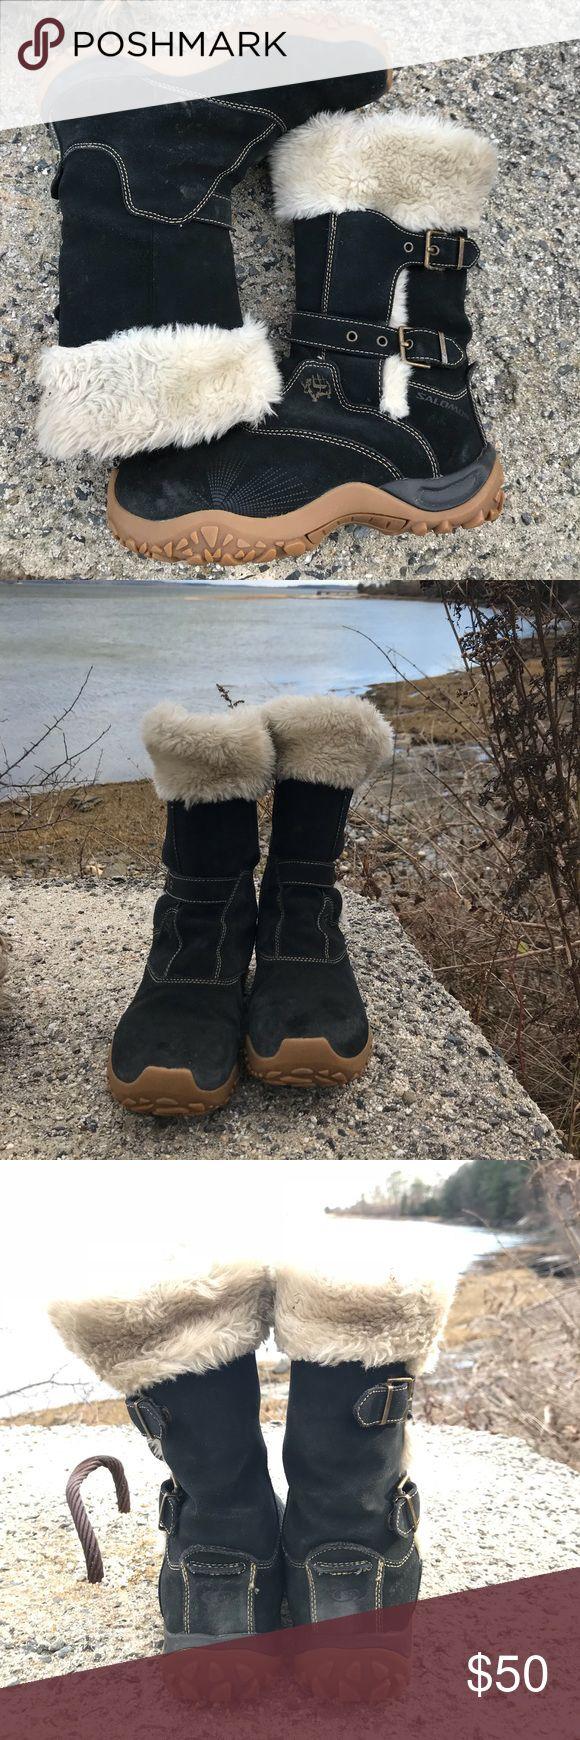 ❄️ Solomon Winter Boots EUC! Suede brown leather, excellent slush soles, furry warm interior, like new!! Salomon Shoes Winter & Rain Boots